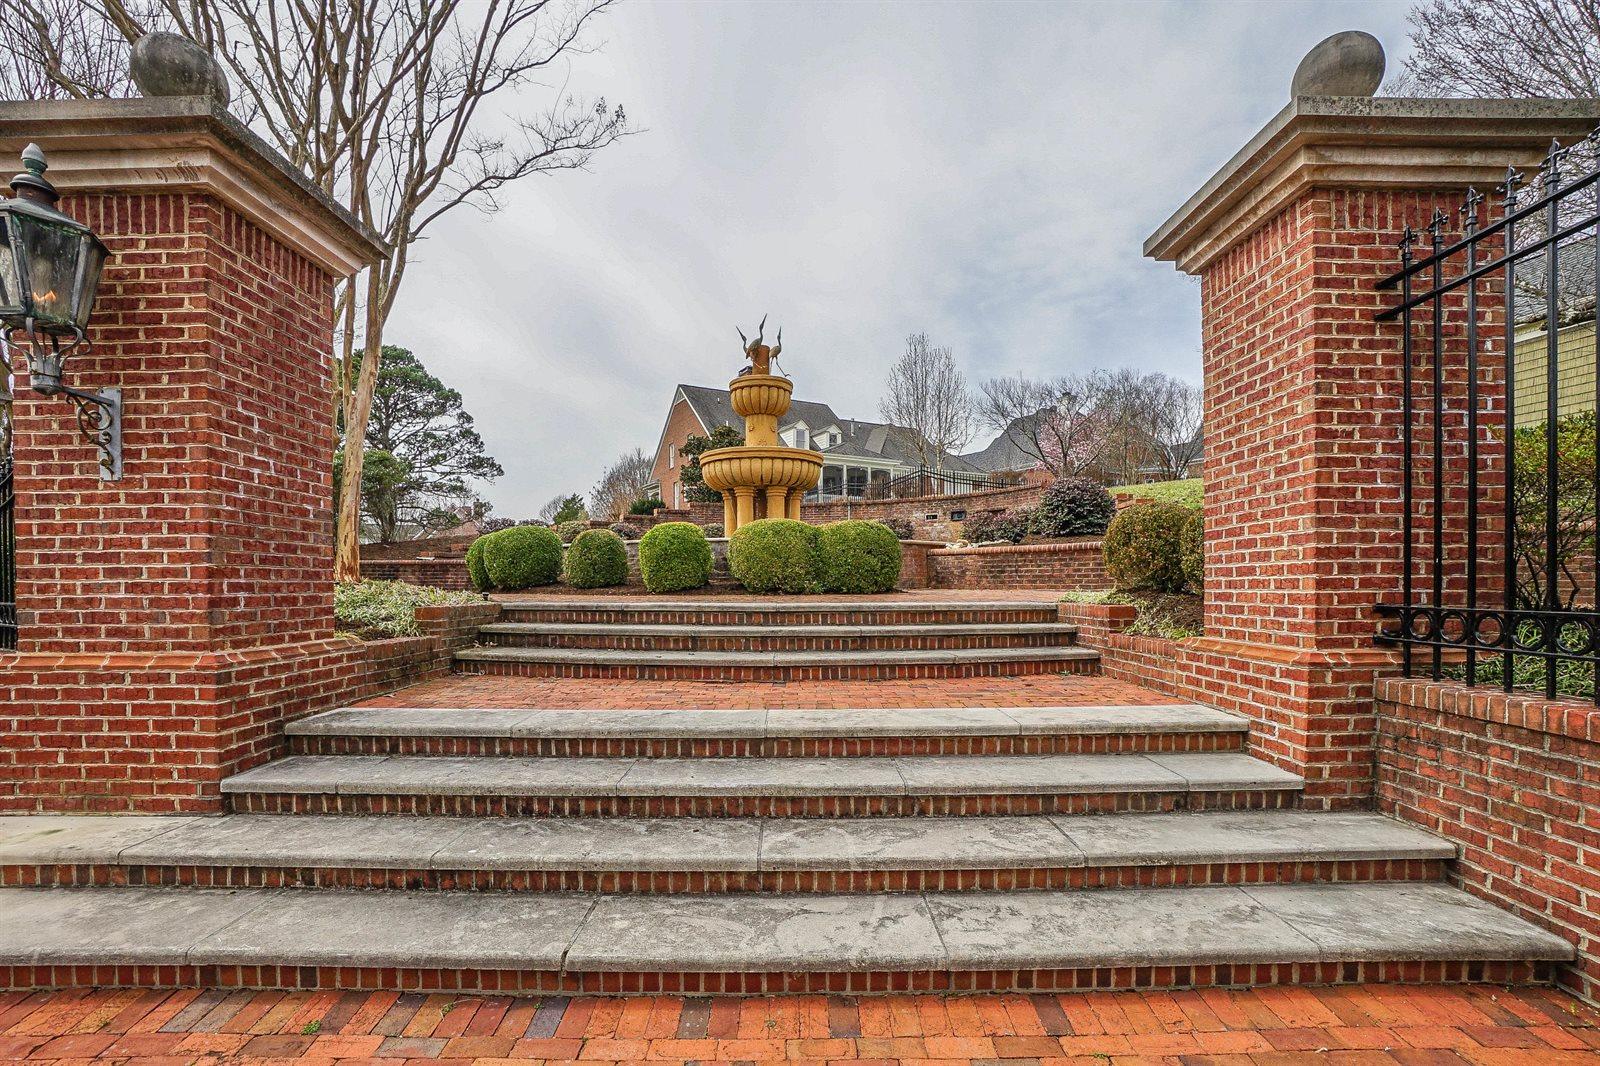 842 Prince George Parish Drive, Knoxville, TN 37934